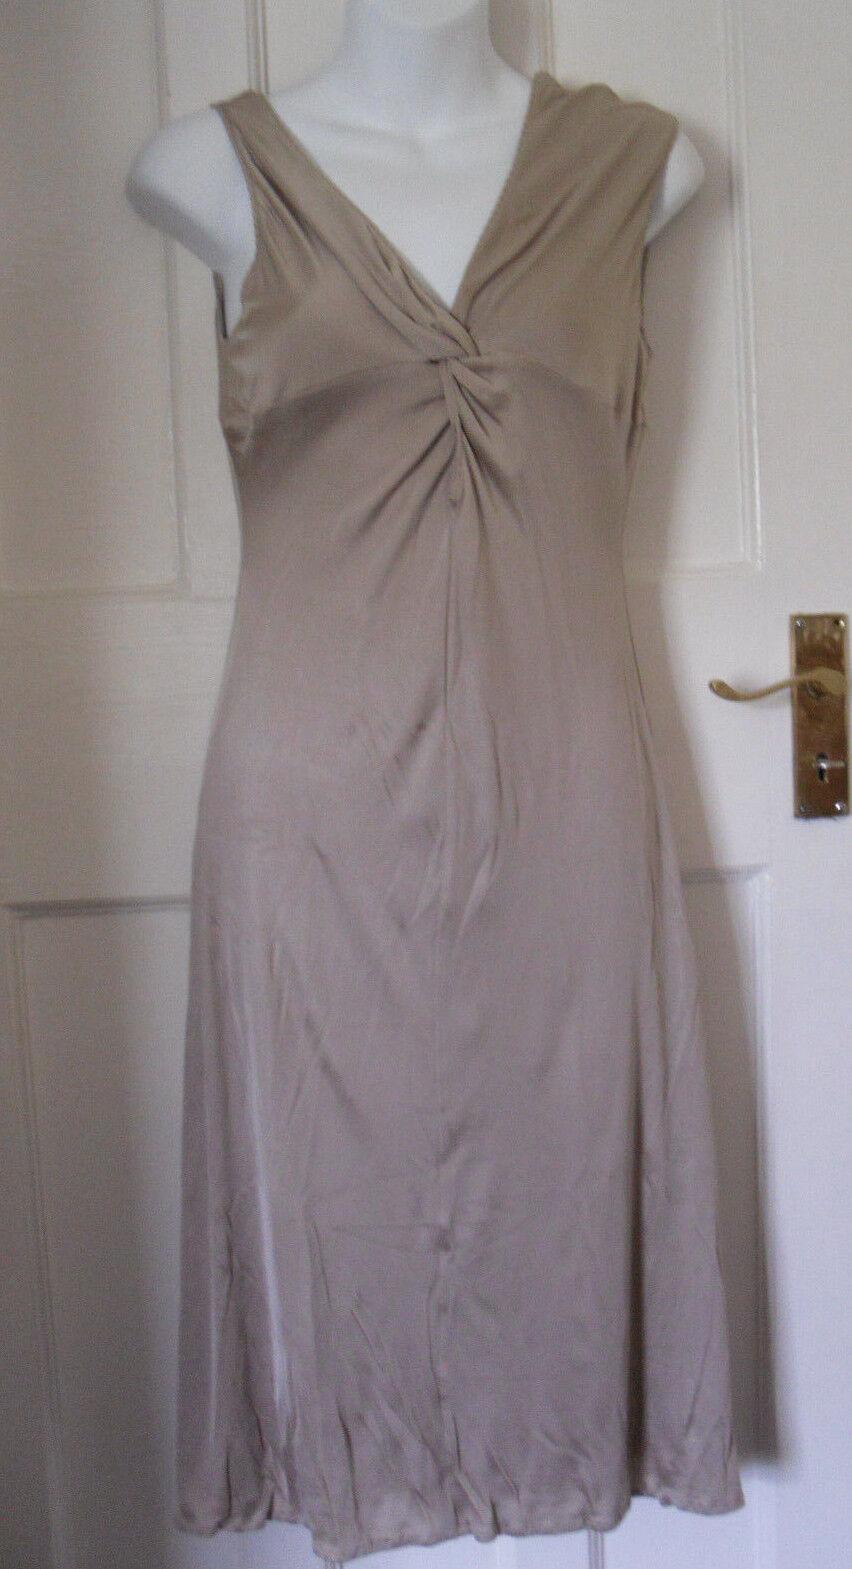 VERSUS VERSACE damen  BEIGE ACETATE NYLON STRETCH DRESS SZ 28 42 UK-8-10(WD19)